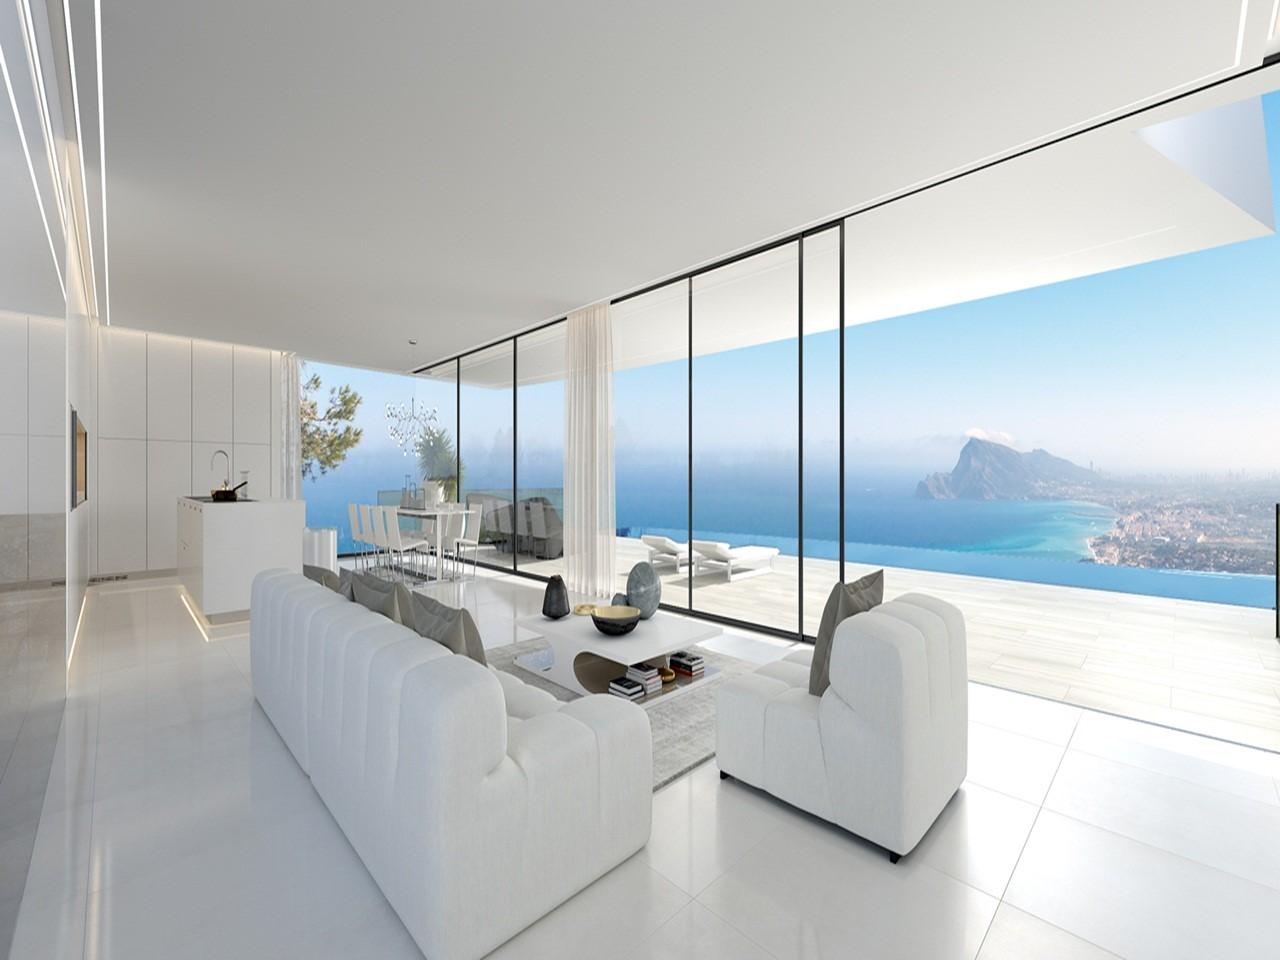 Villa de style moderne de 4 chambres - Costa Blanca - Altea - Espagne